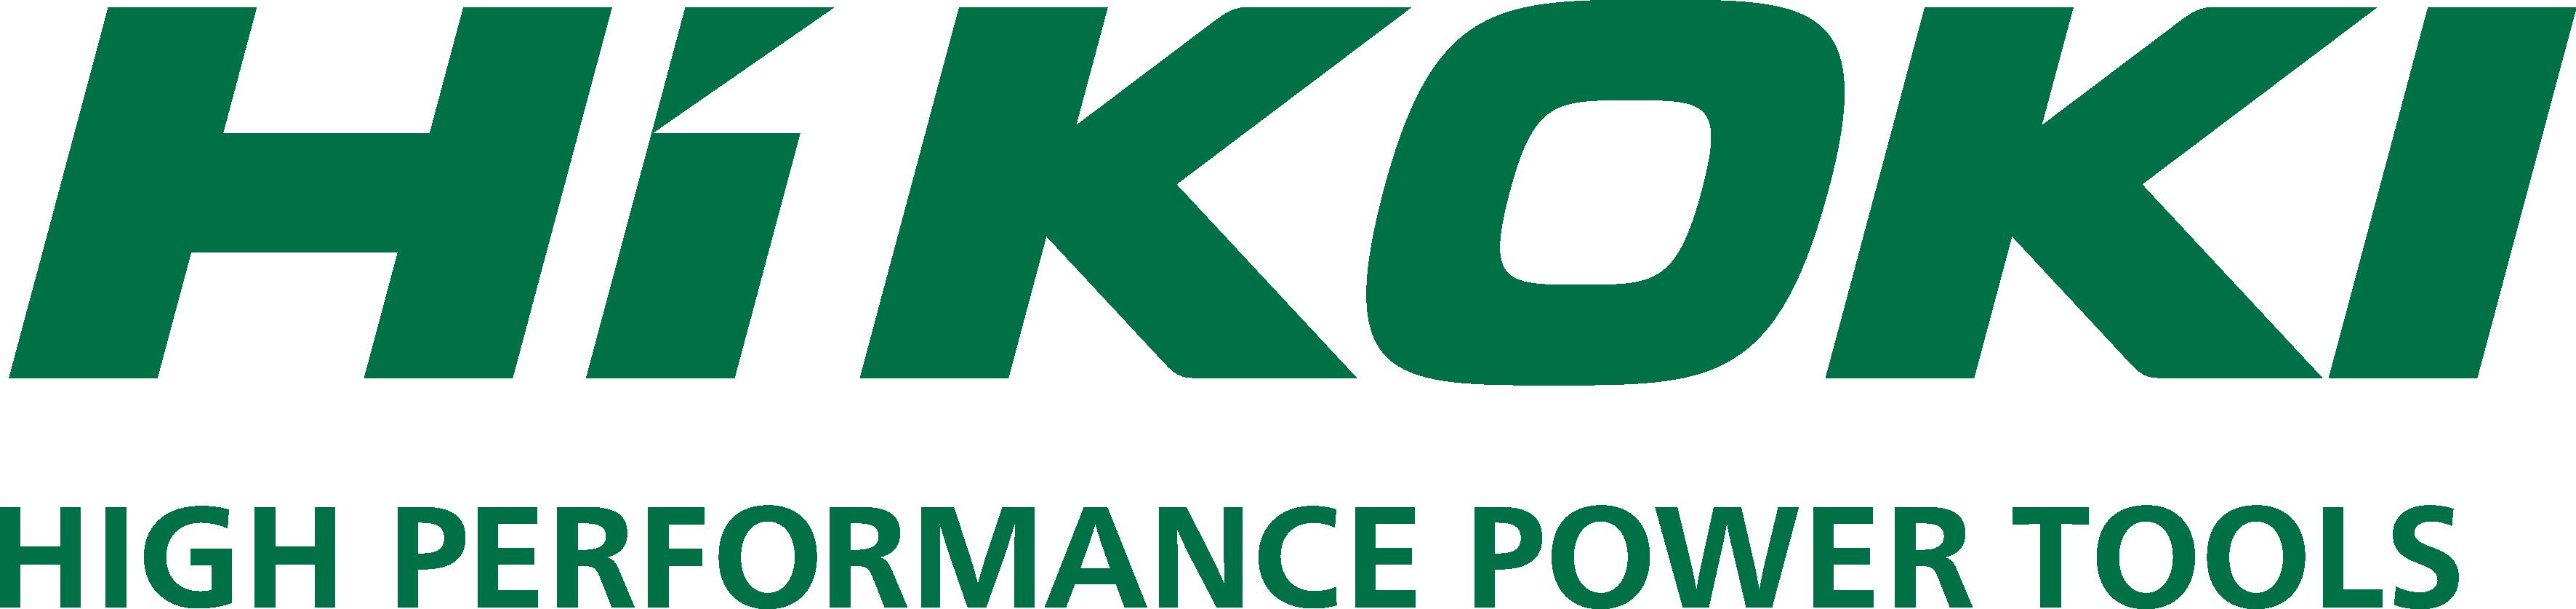 HiKOKI logo slogan green